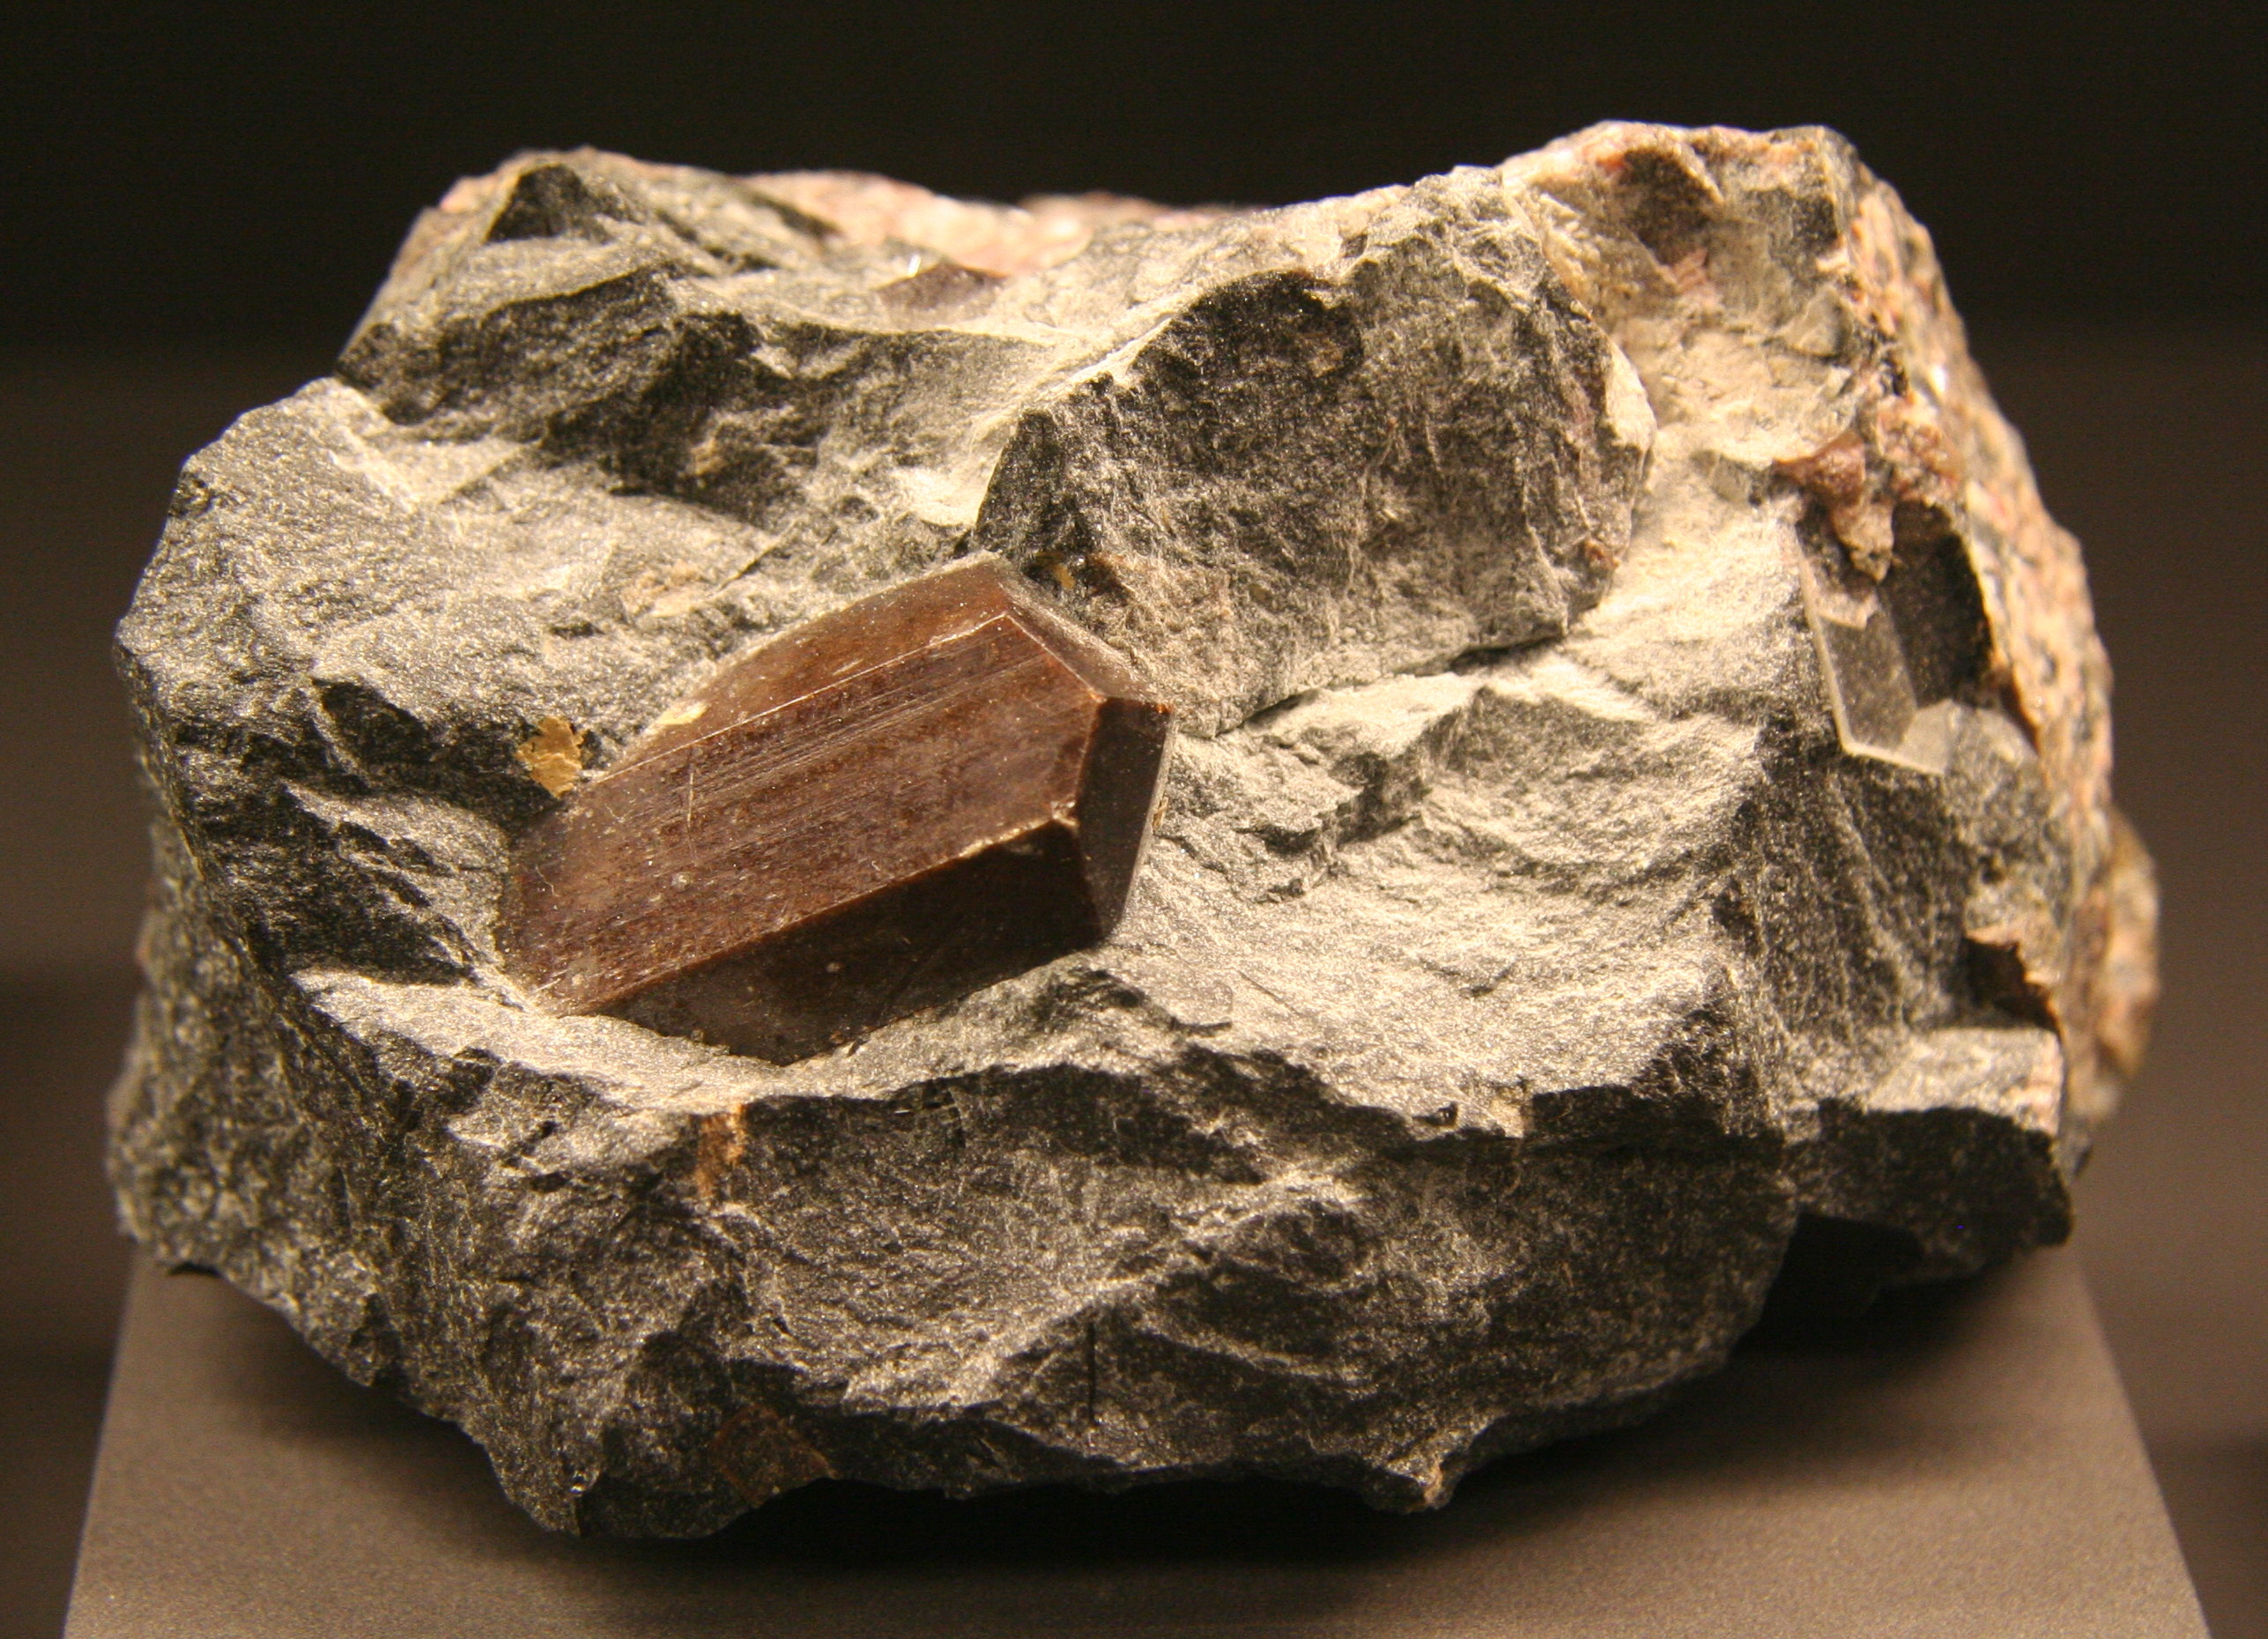 File:Lorenzenit Lovozero Kola-Halbinsel Russland Terra Mineralia.jpg